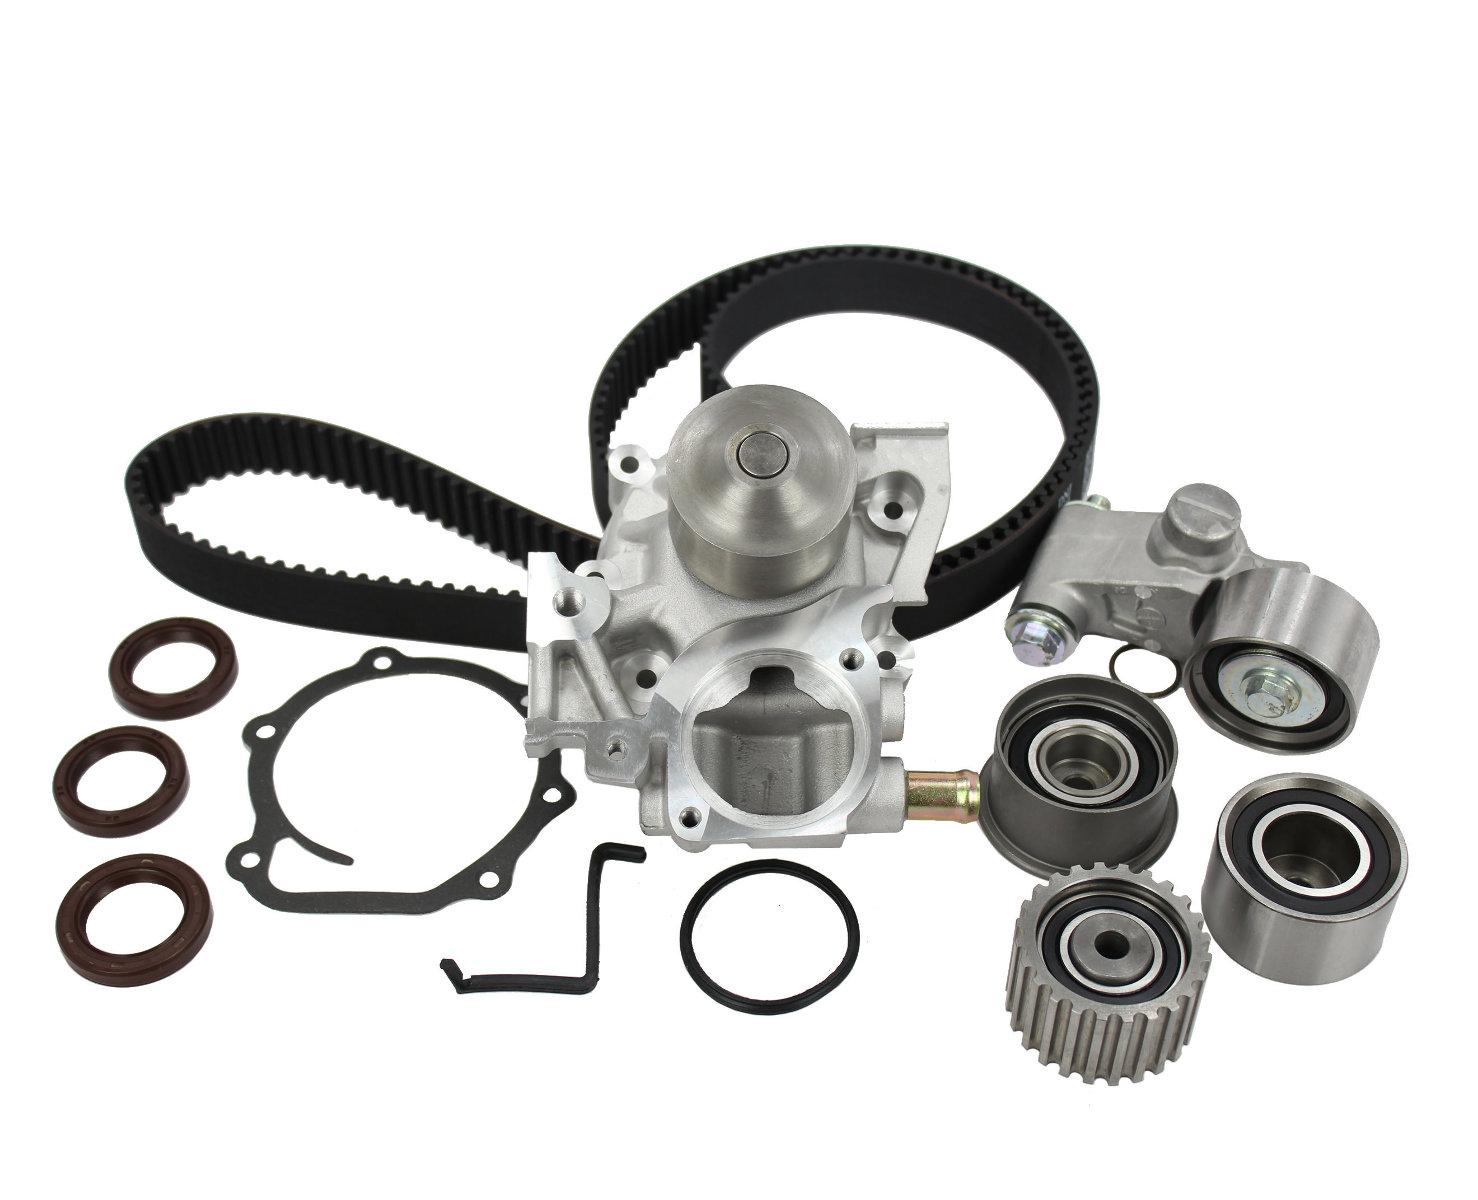 Dnj Tbk715awp Timing Belt Kit With Water Pump Ebay For Subaru Legacy